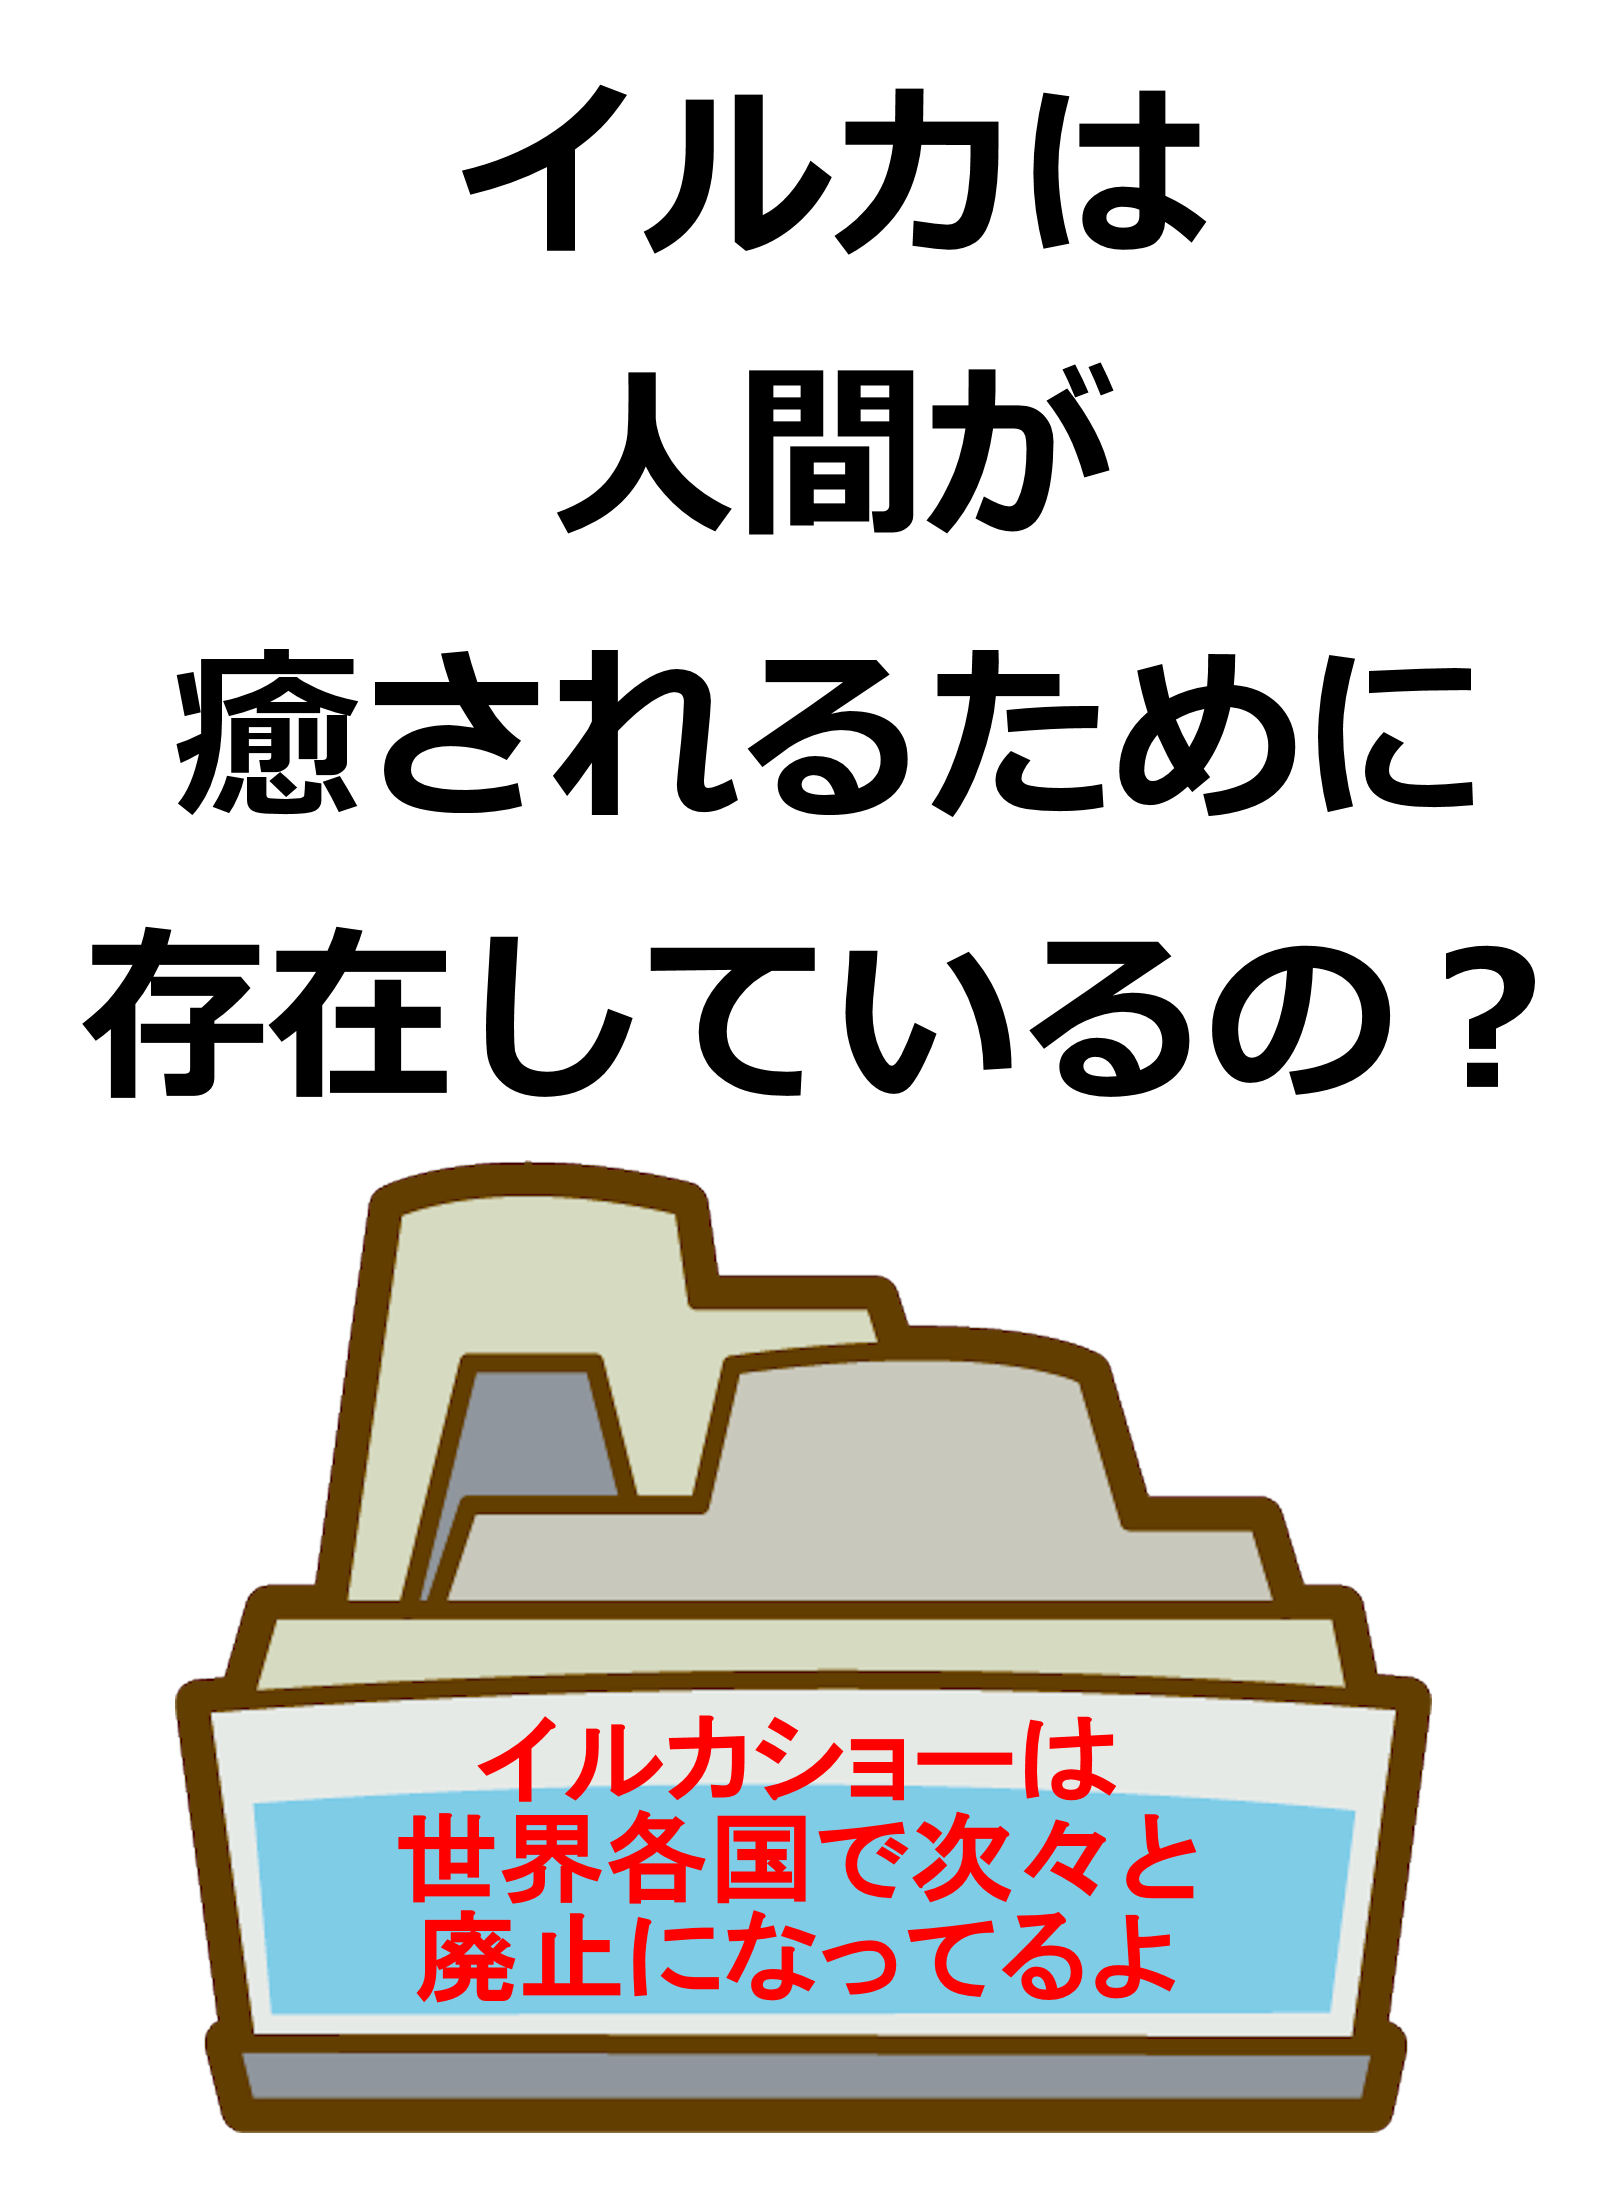 japandolphinsday1.jpg